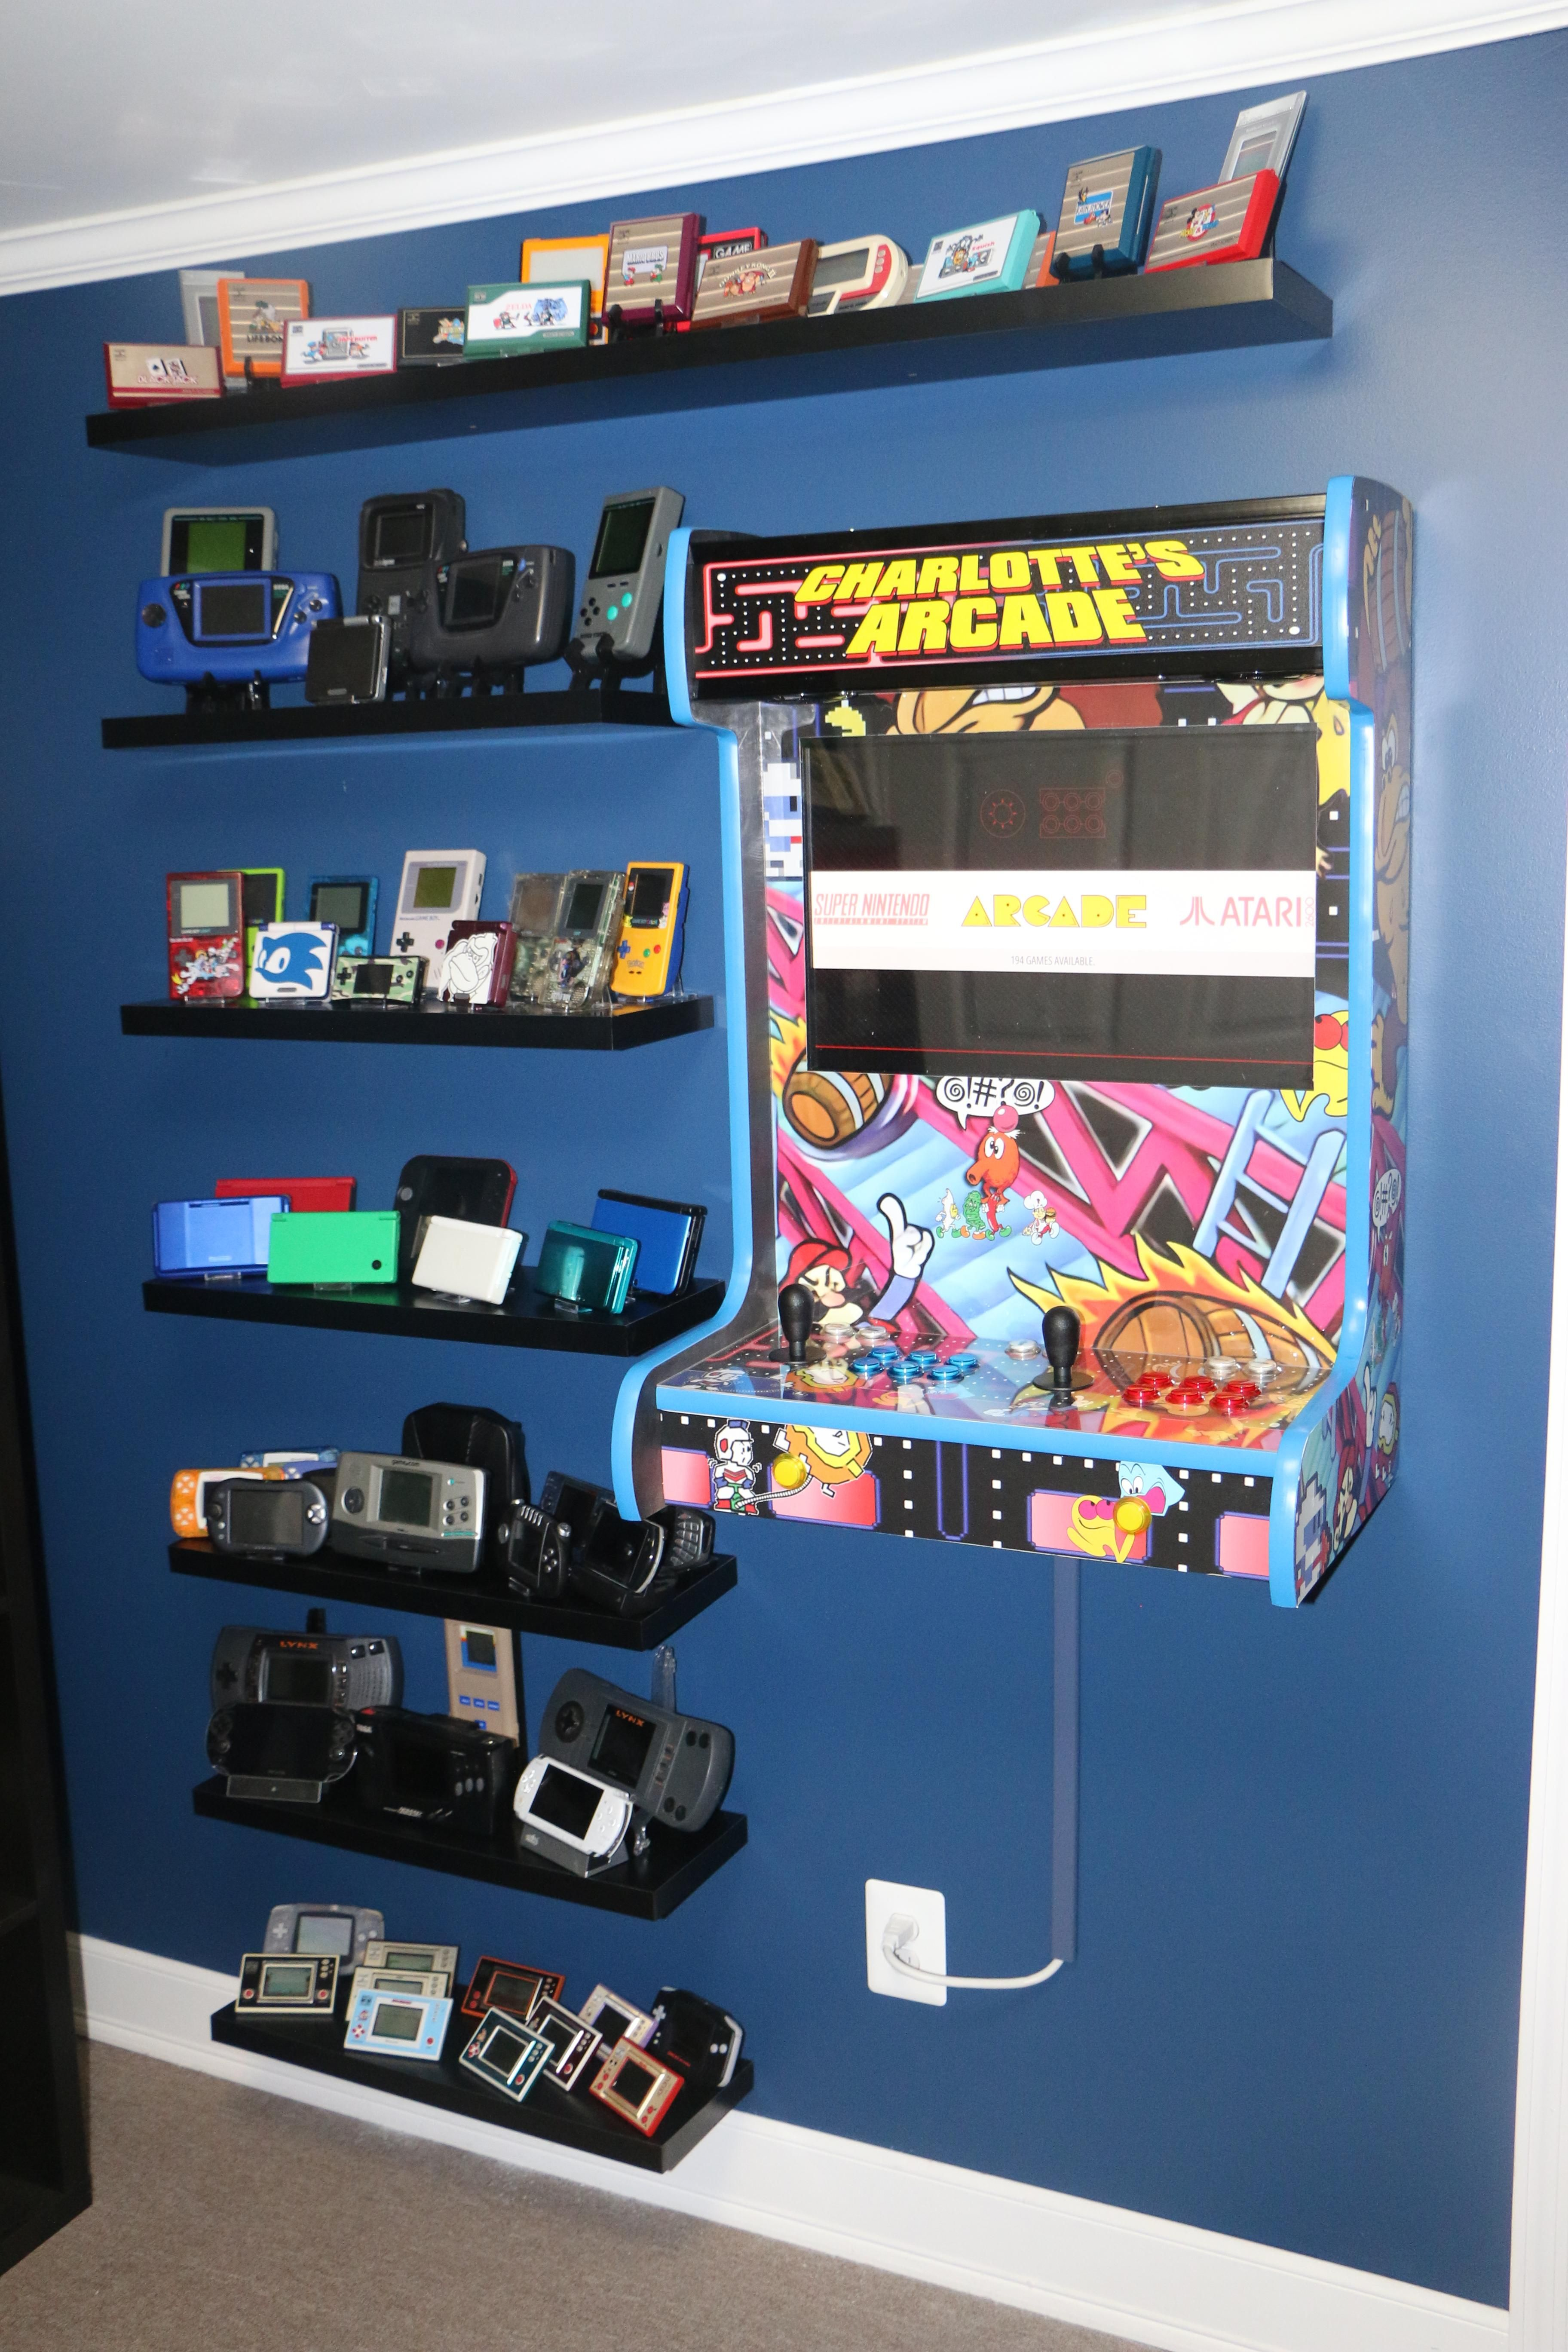 Retro Gaming Wall Handheld Collection Shelves And Wall